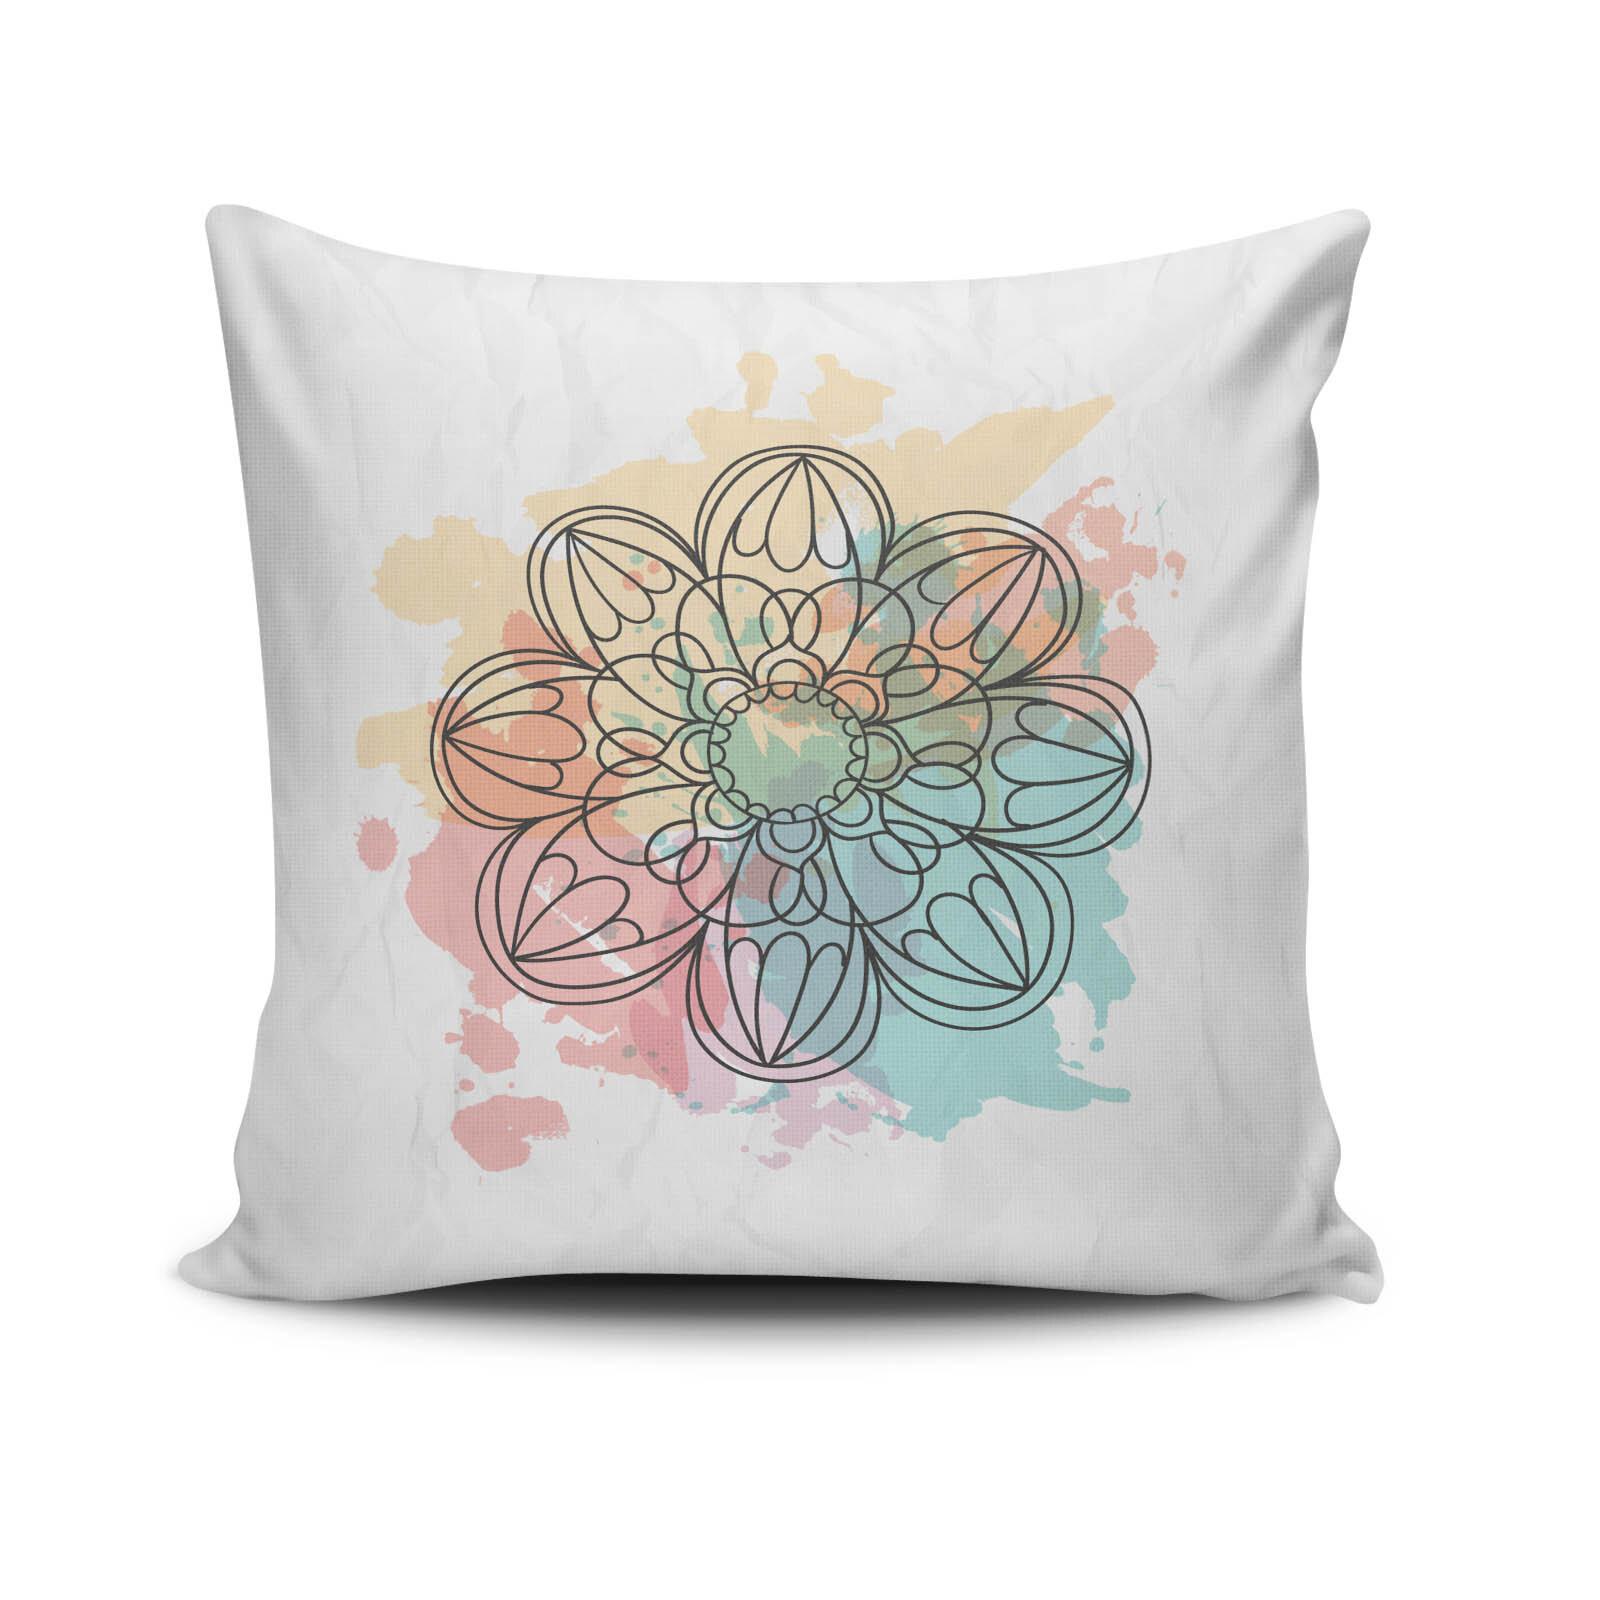 Perna decorativa Cushion Love, Dimensiune: 45 x 45 cm, Material exterior: 50% bumbac / 50% poliester 768CLV0230